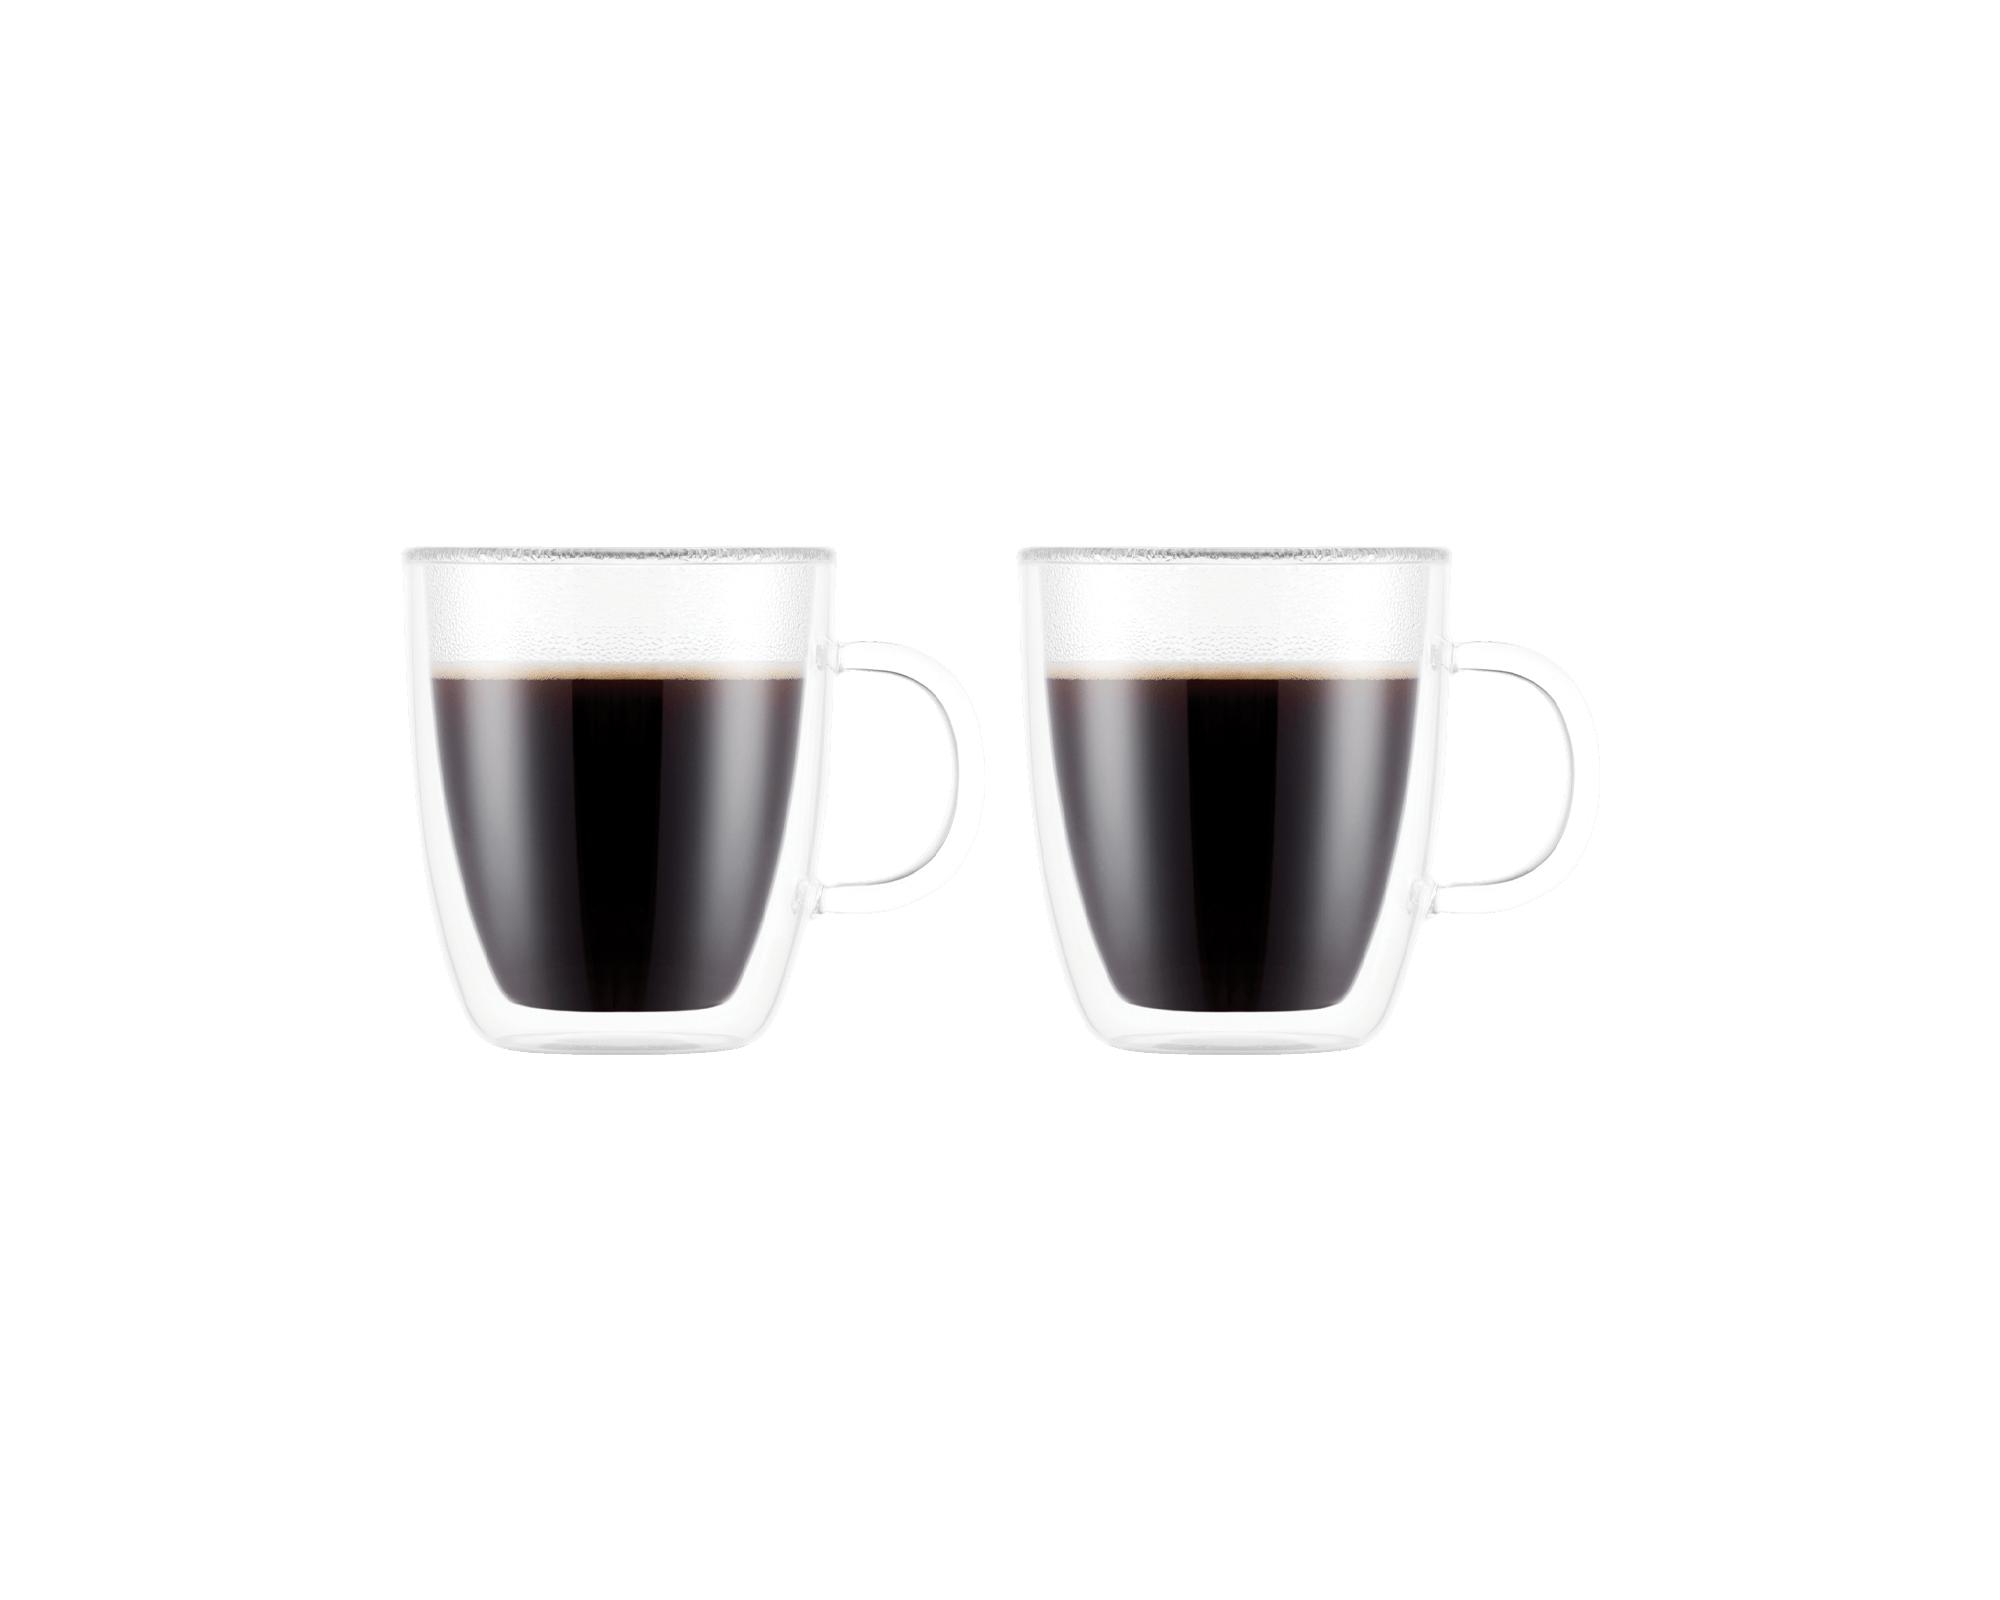 Set de 2 tasses expresso Bistro de Bodum I Café Michel